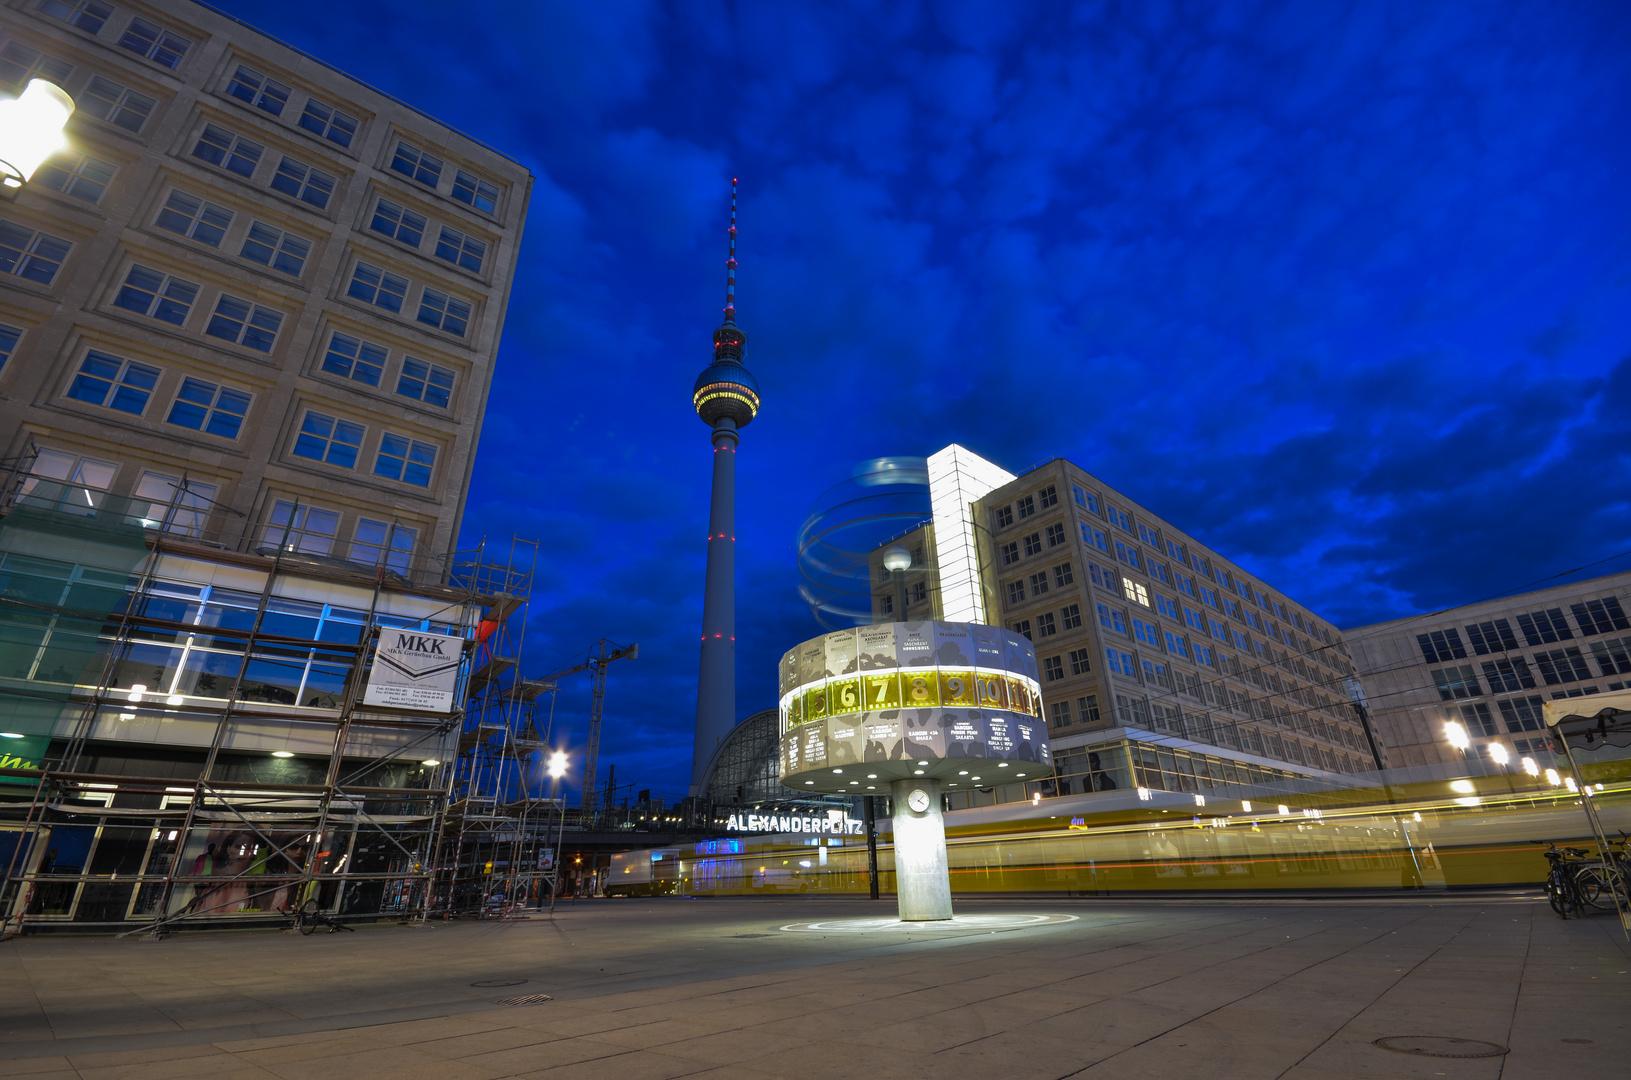 Early Morning @ Berlin